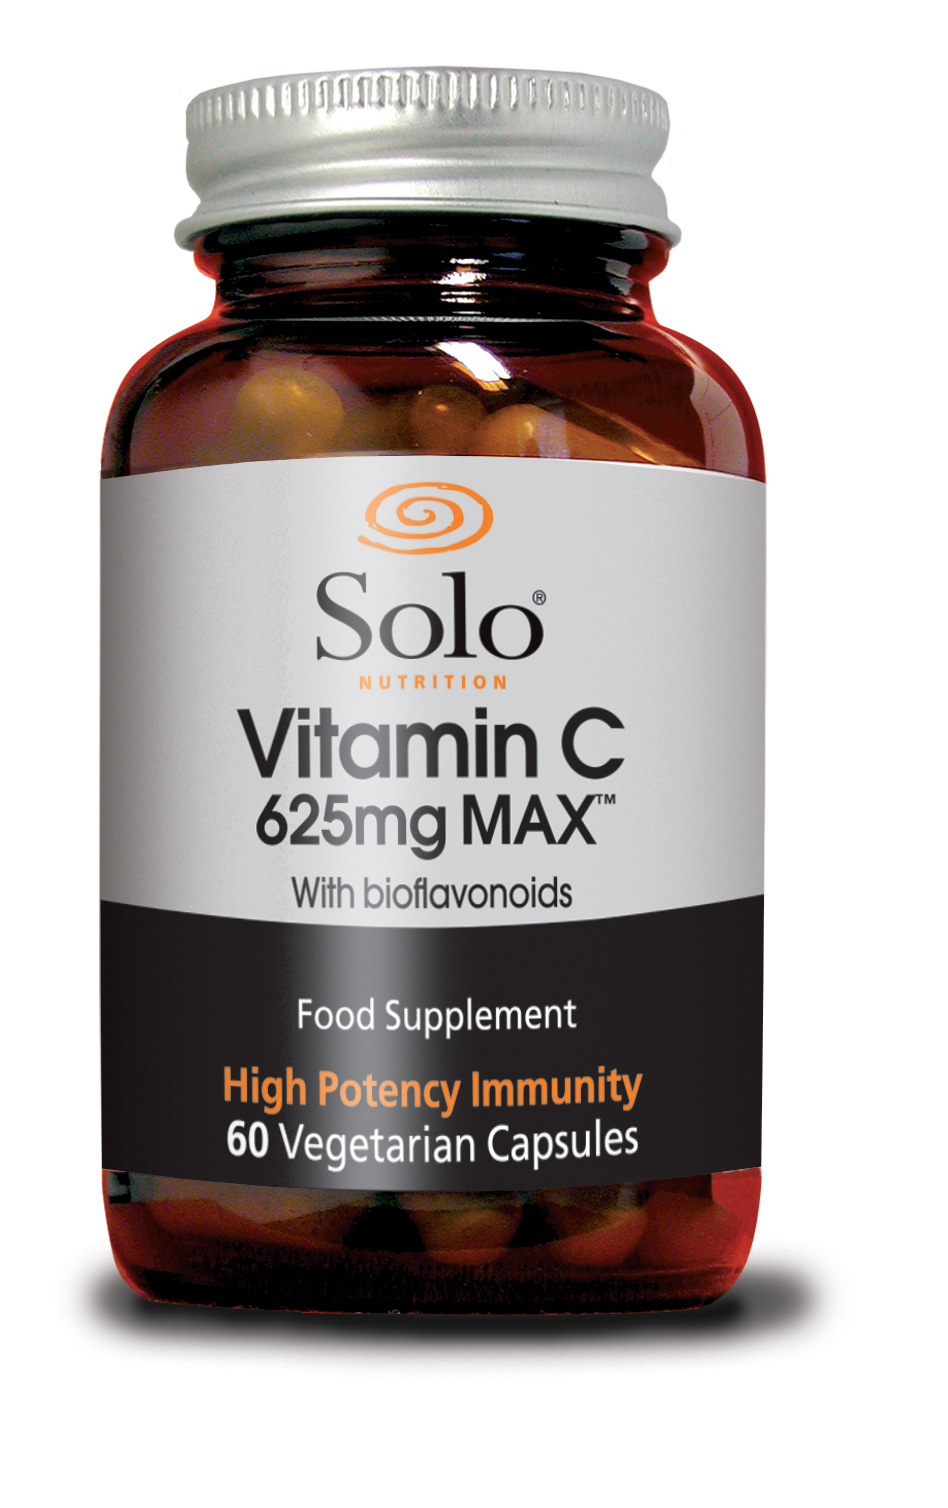 Vitamin C 625mg Max